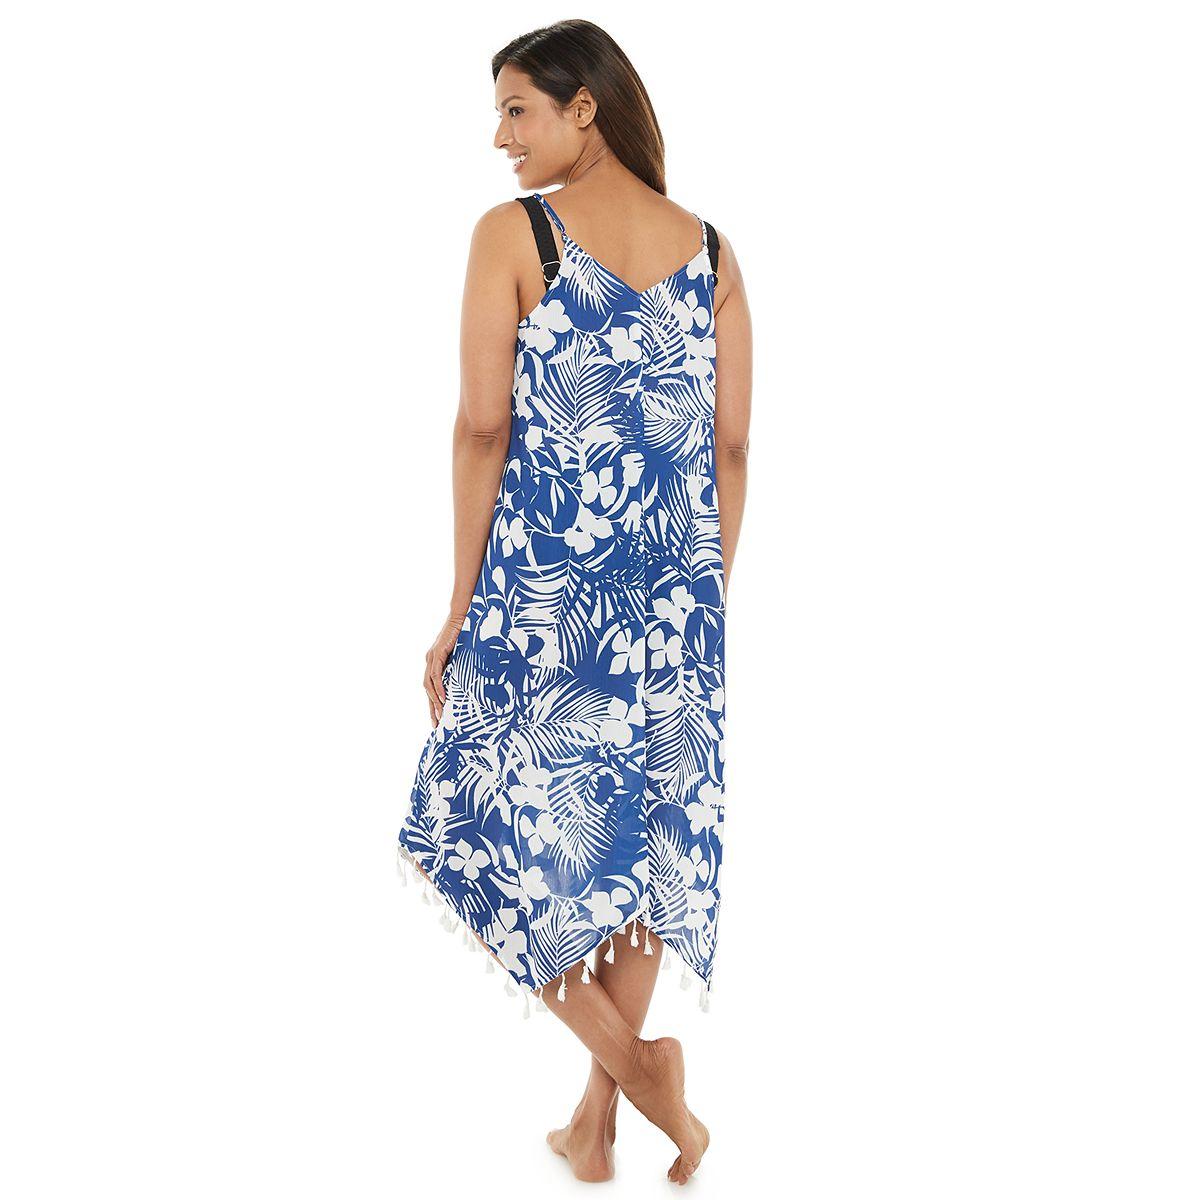 Women's Beach Scene Tassel Trim Handkerchief Hem Cover-Up Dress Lagoon G7qwj